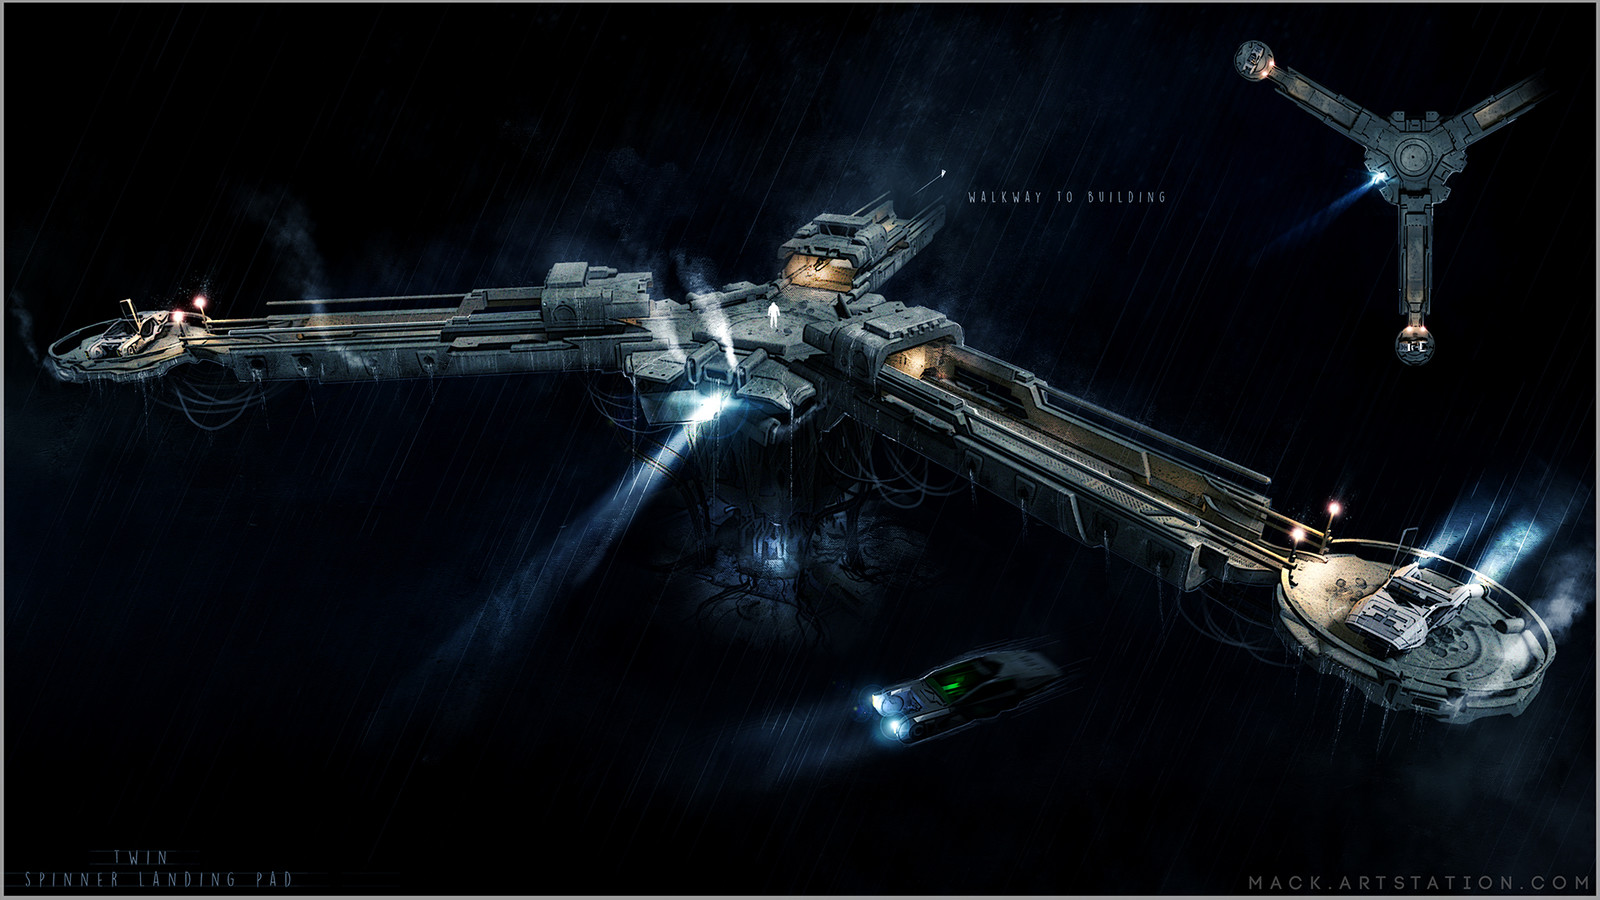 Blade Runner Landing Pad